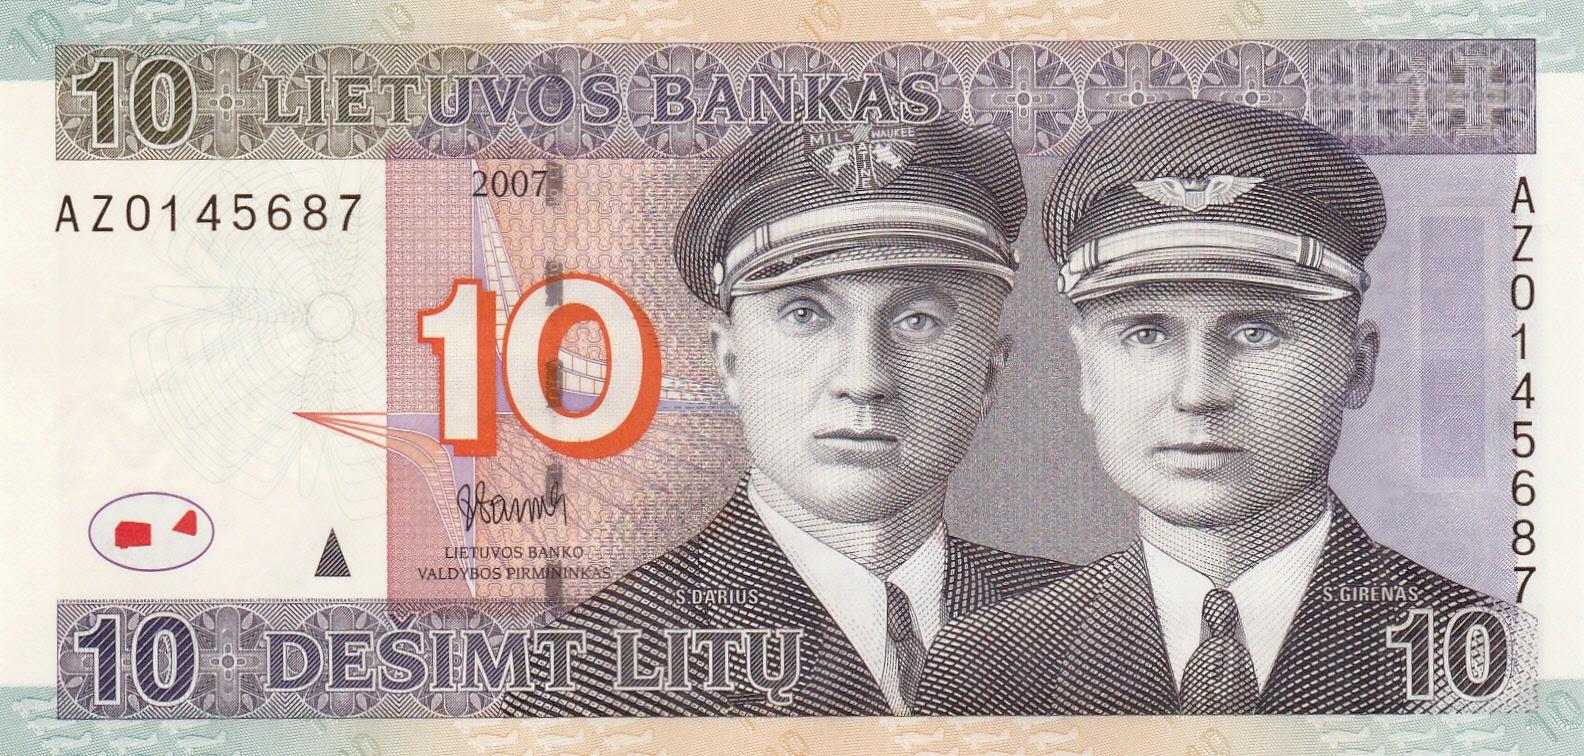 10 Lithuanian Litas banknote